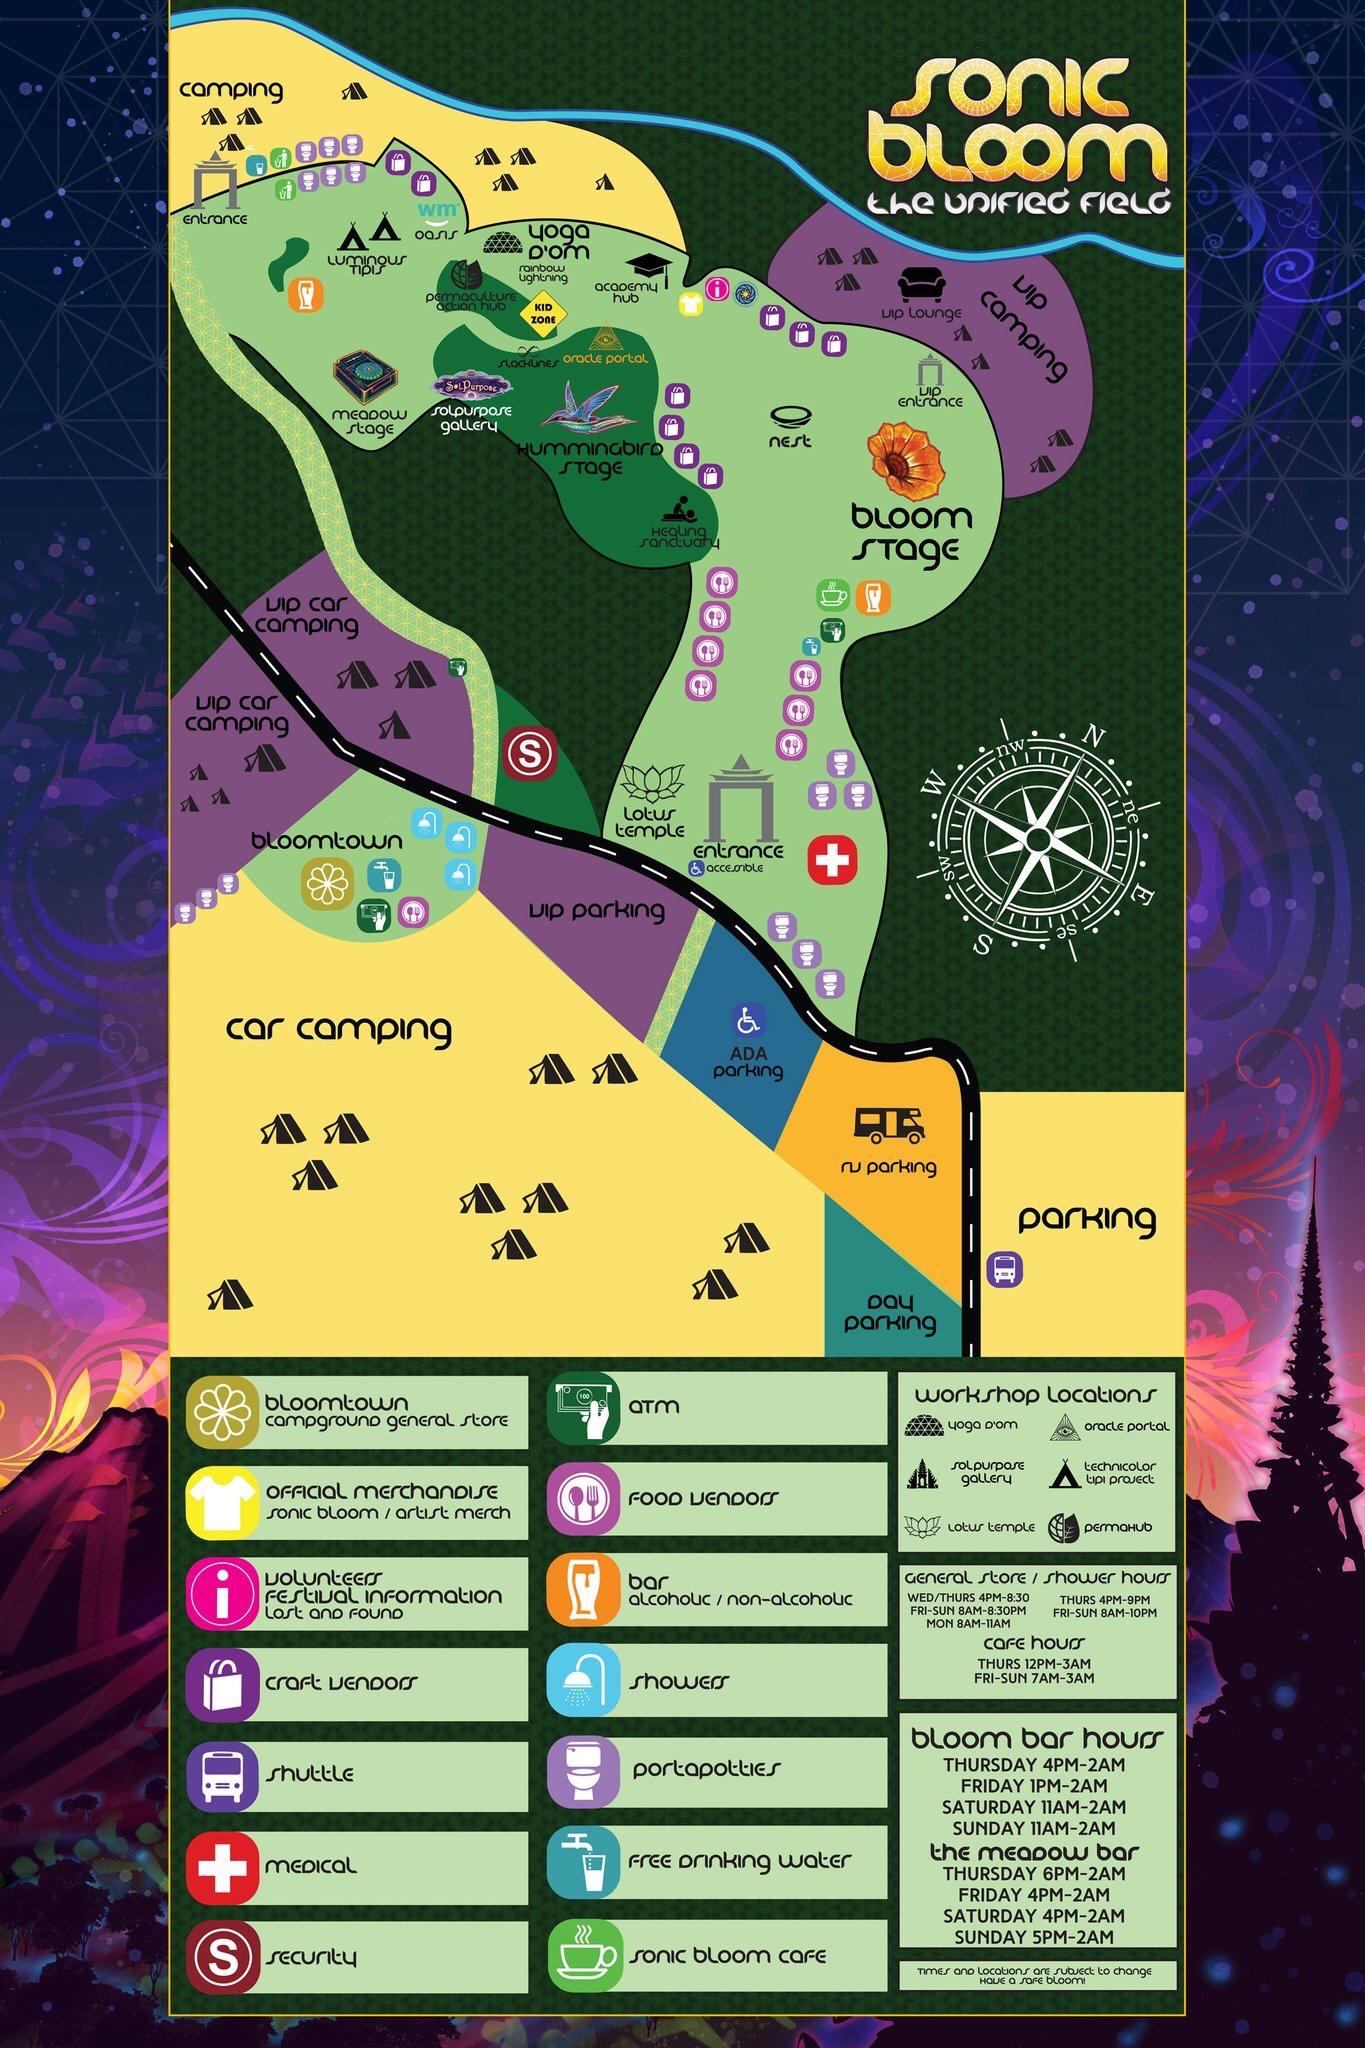 Sonic Christmas Hours.Sonic Bloom 2017 Set Times Festival Map More Edm Identity